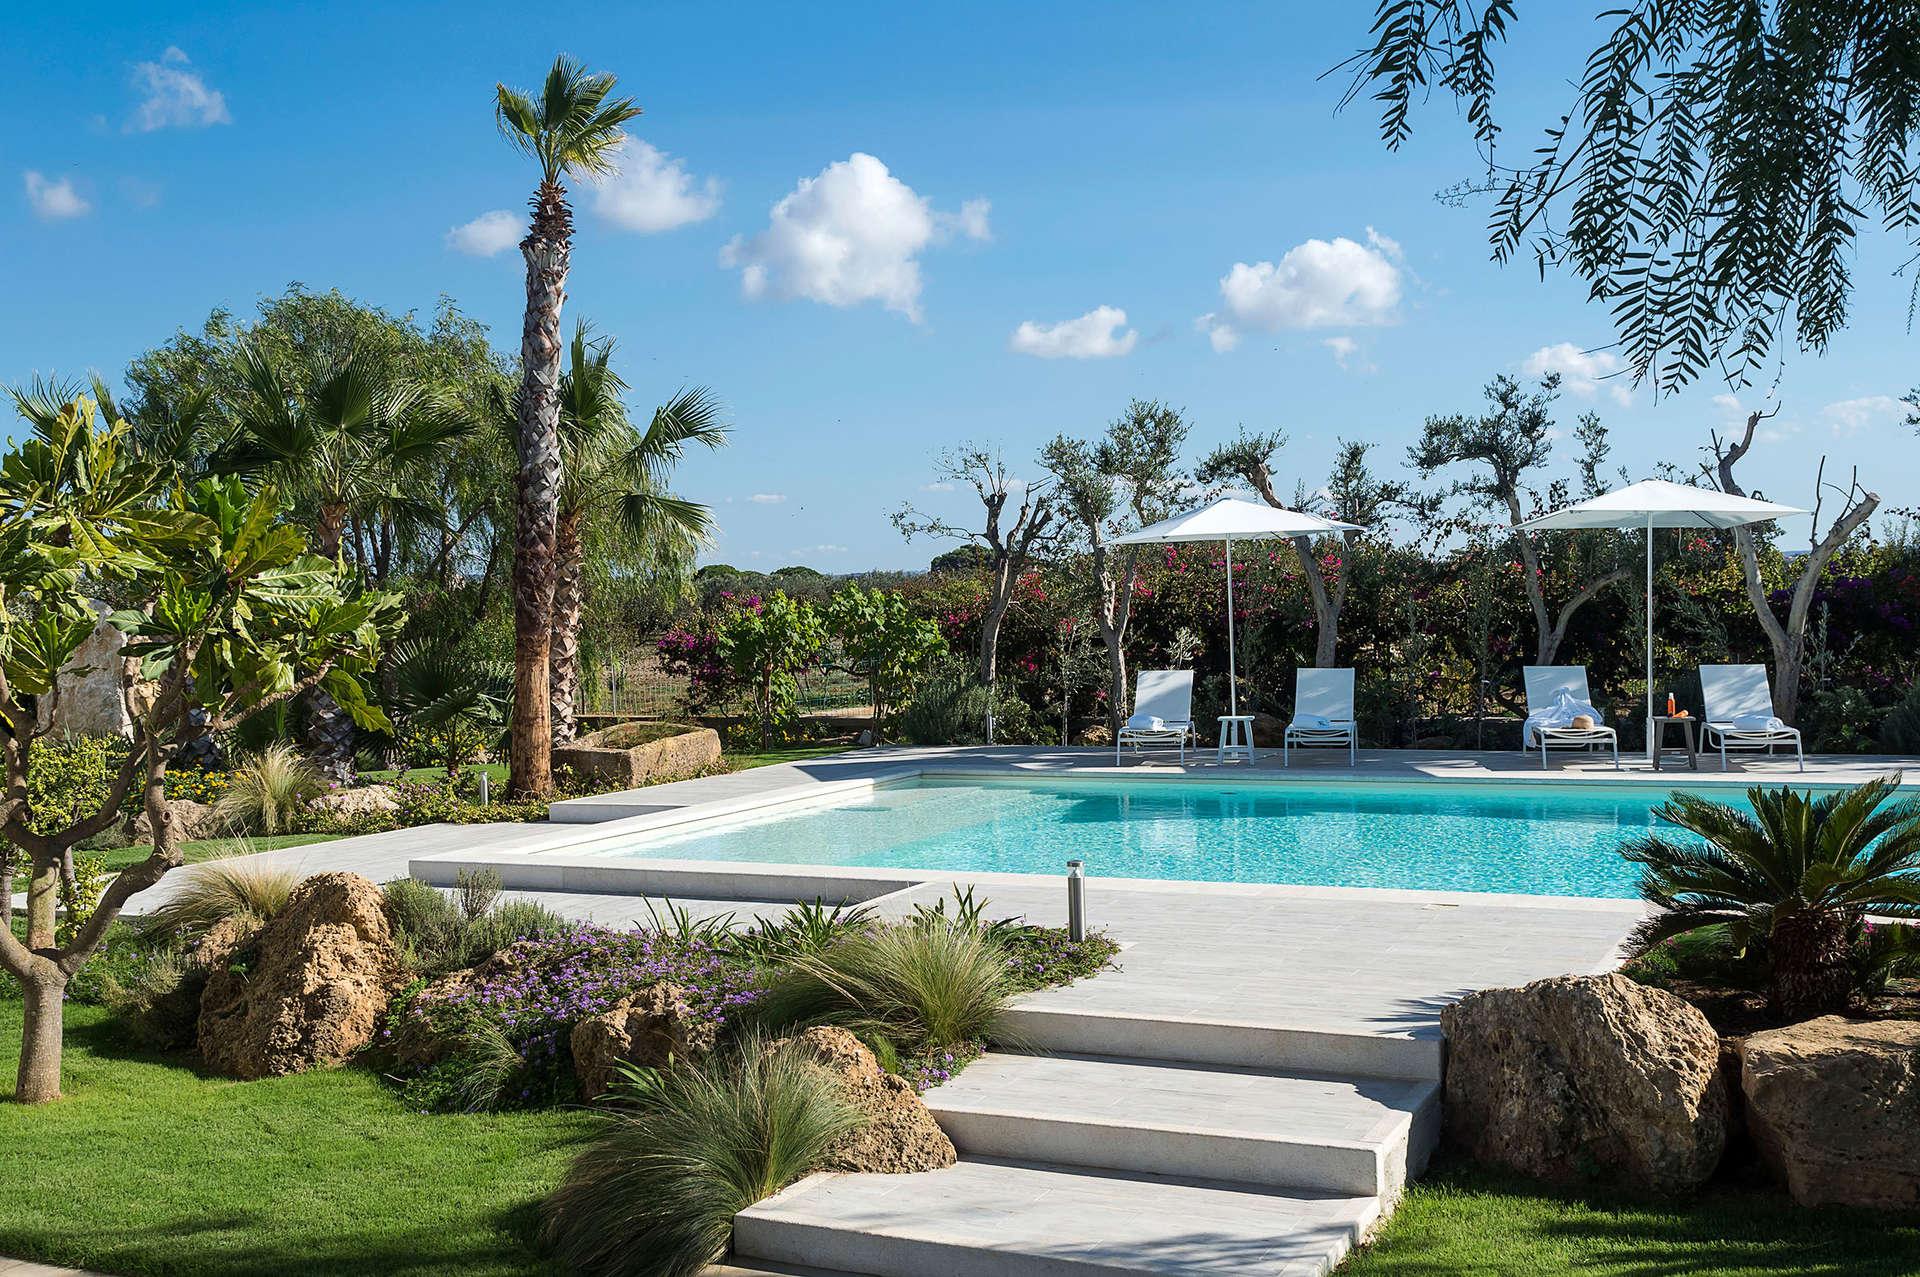 Luxury vacation rentals europe - Italy - Sicily - Trapani - Salinella - Image 1/53